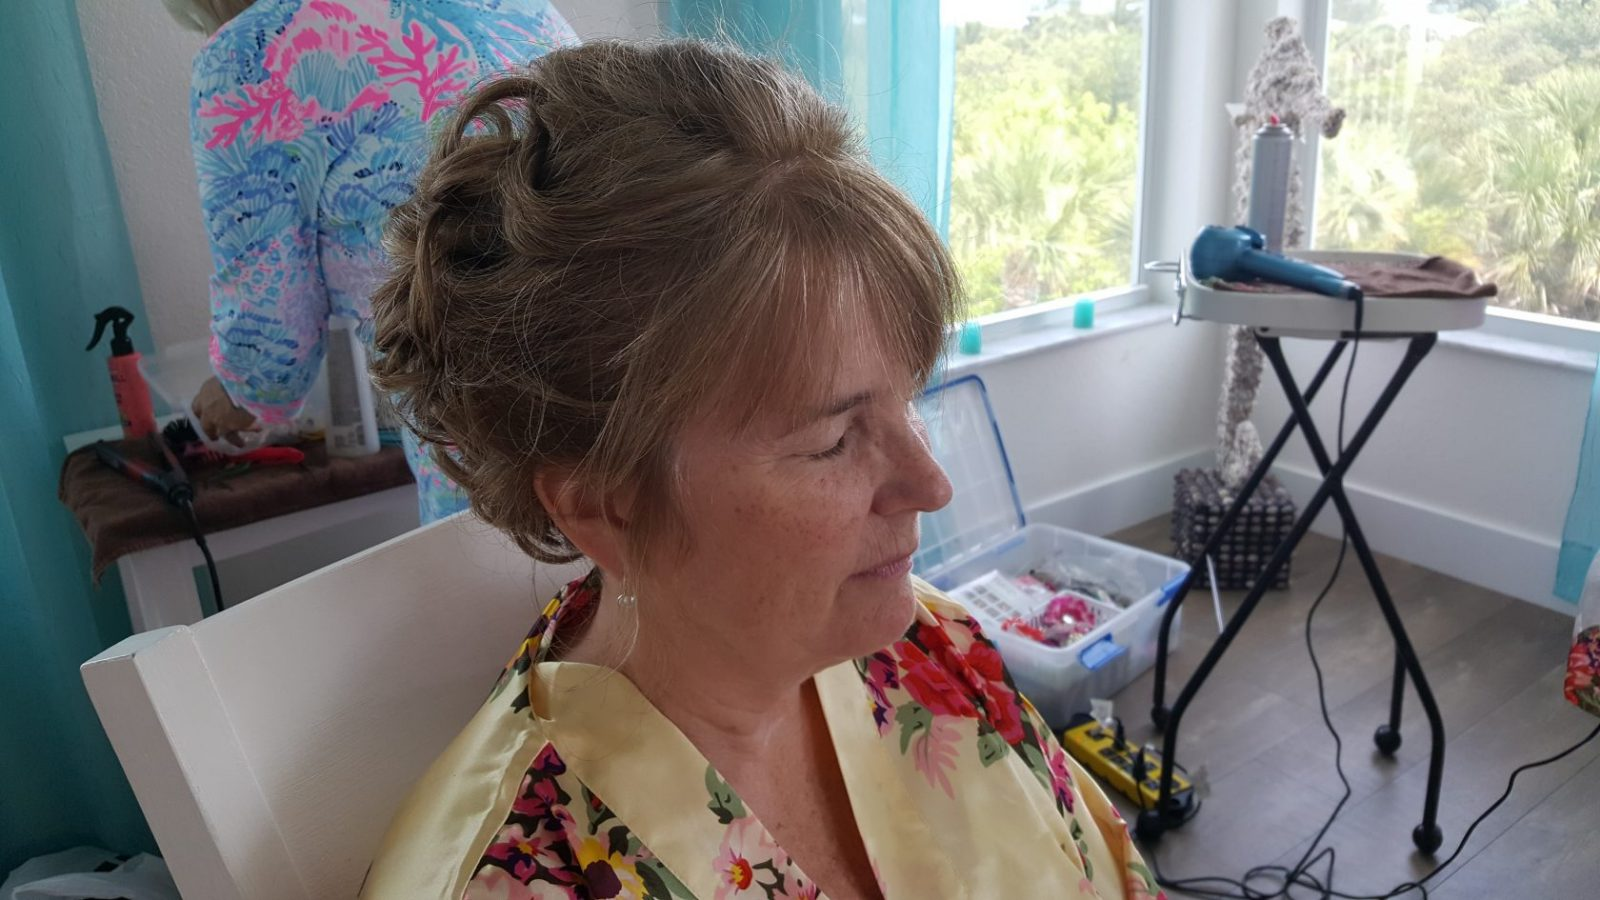 Shear Sailing Hair Salon Bridal Party Pre-Wedding Hair Services Up Do